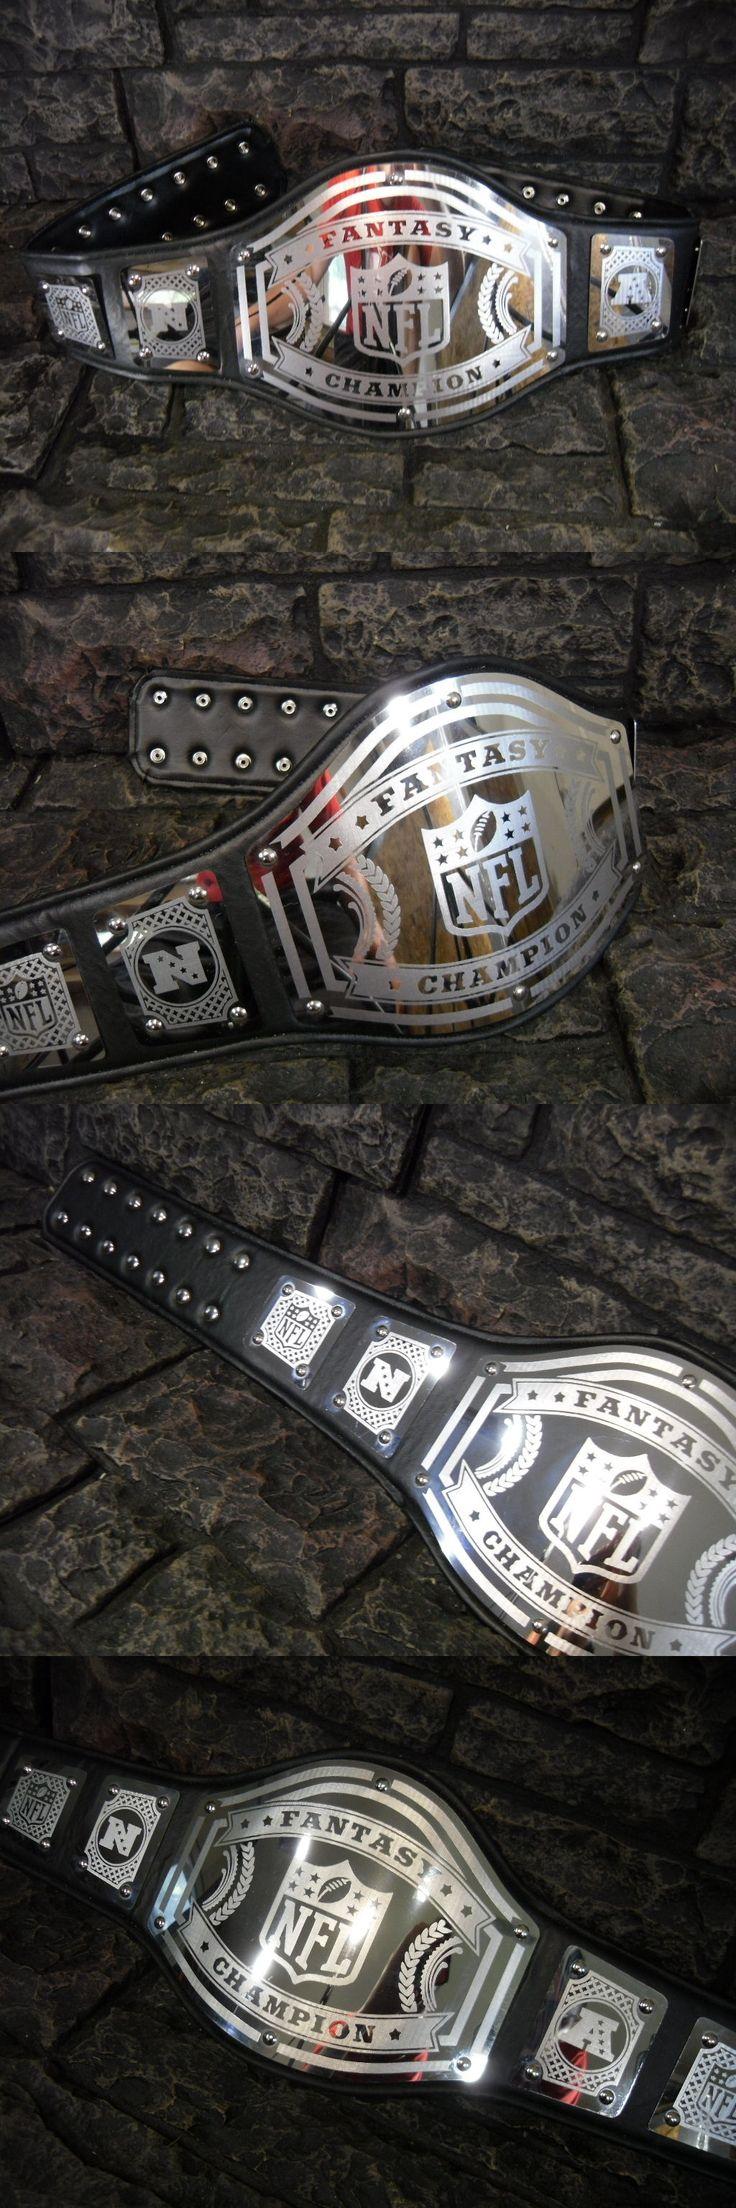 Wrestling 2902: New Fantasy Football Championship Belt Avenger Black Adult Metal Plates Nfl Wwf -> BUY IT NOW ONLY: $149.99 on eBay!